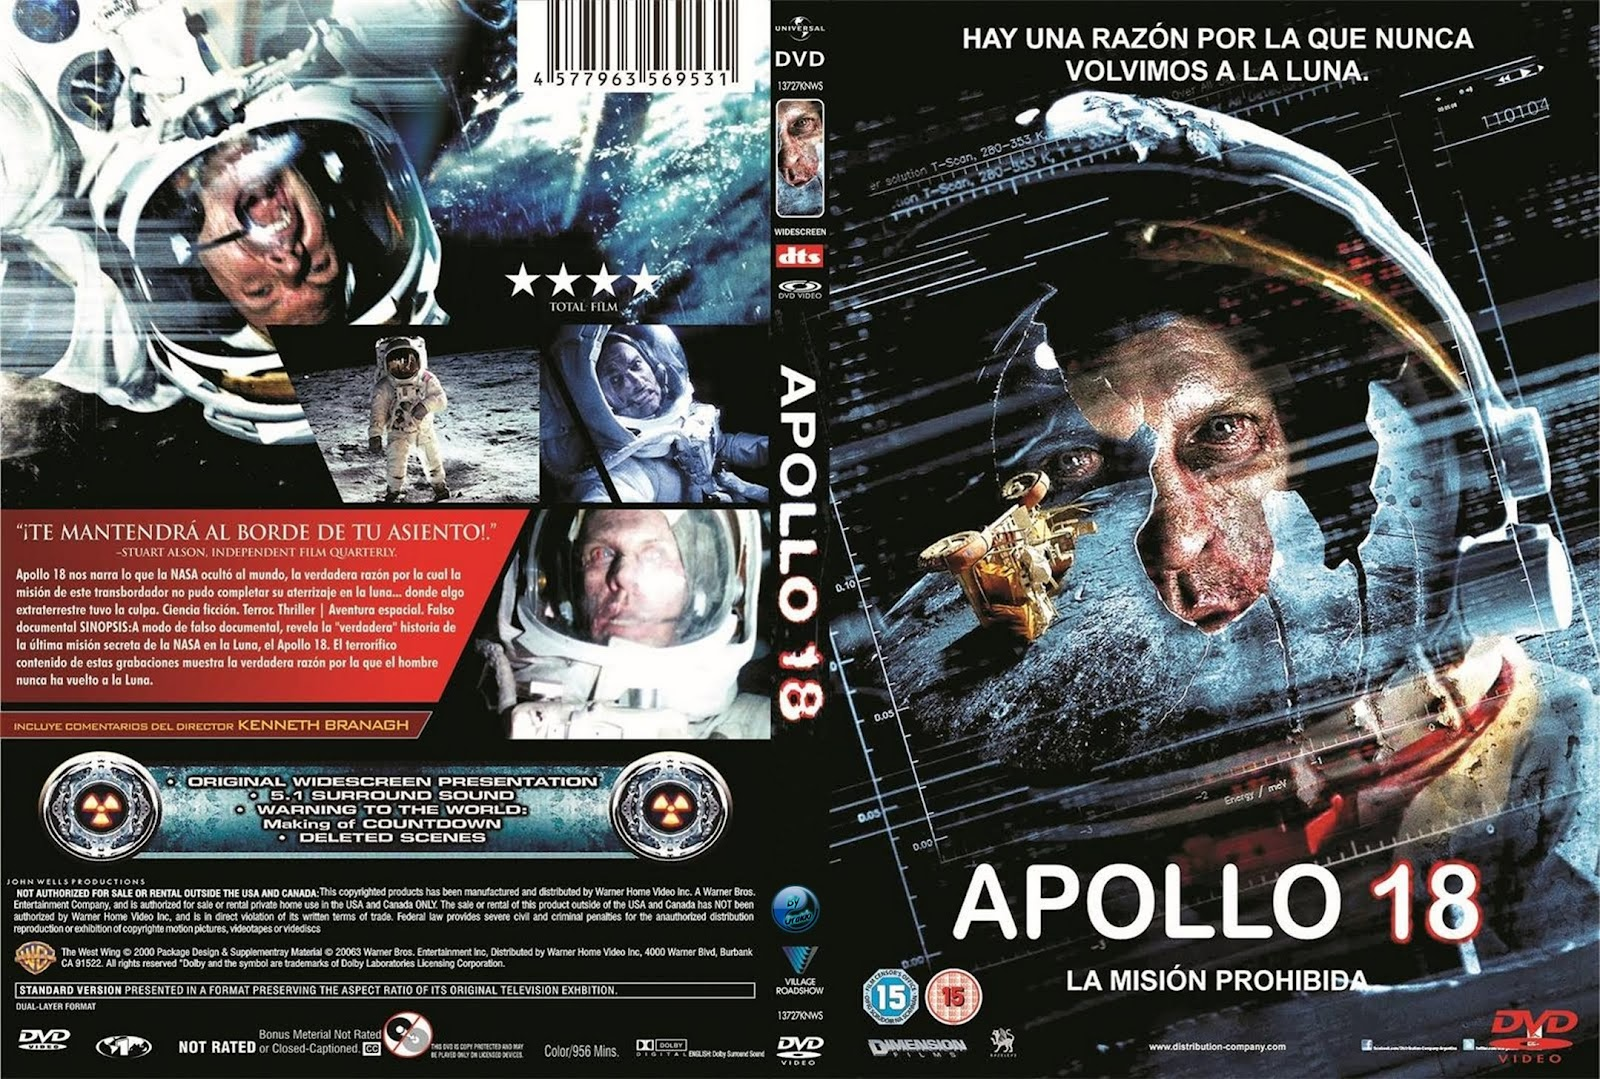 apollo 18 crew deaths - photo #25